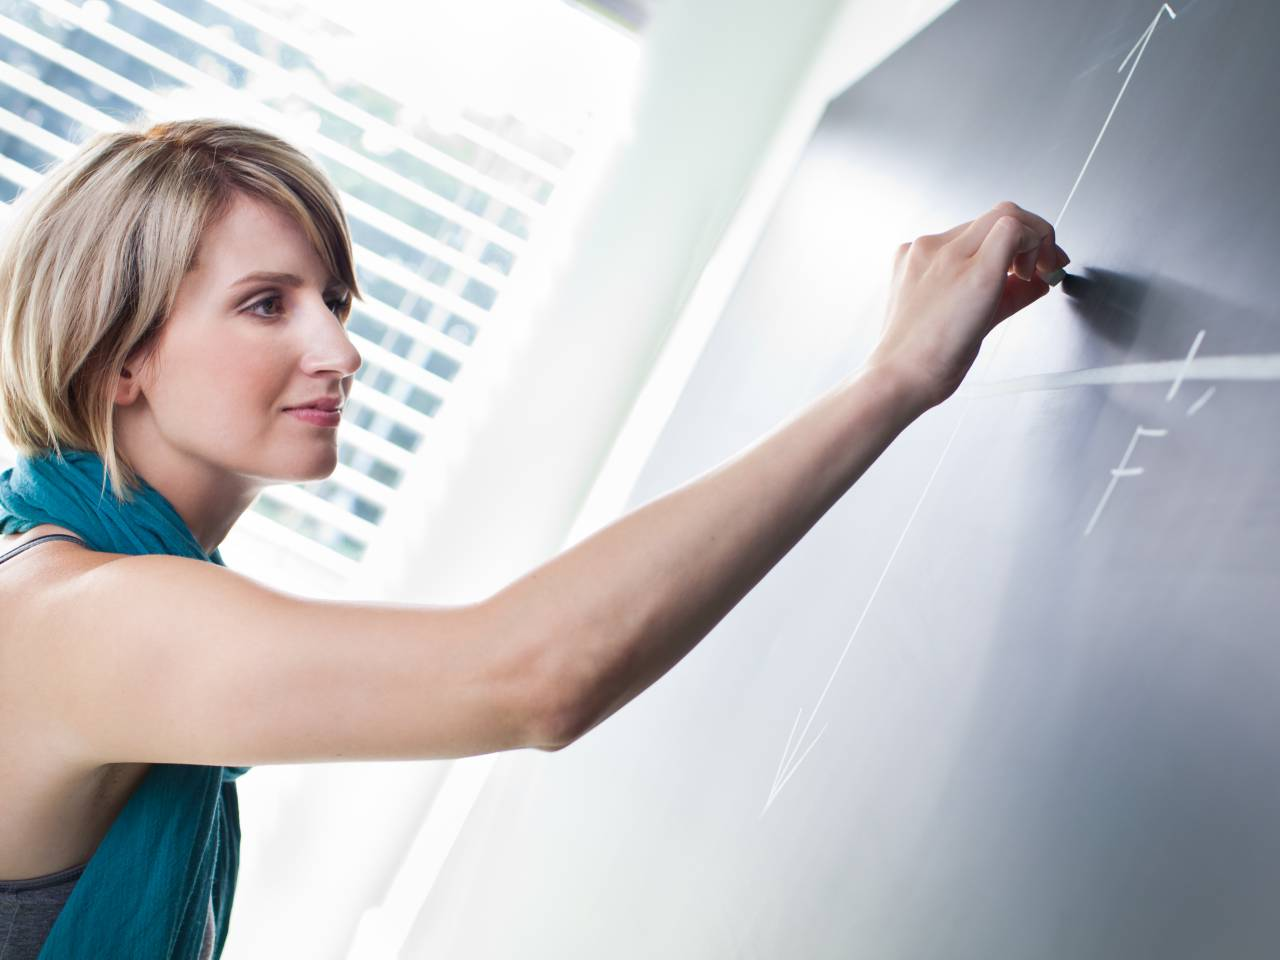 Classroom Teacher Teaching Students